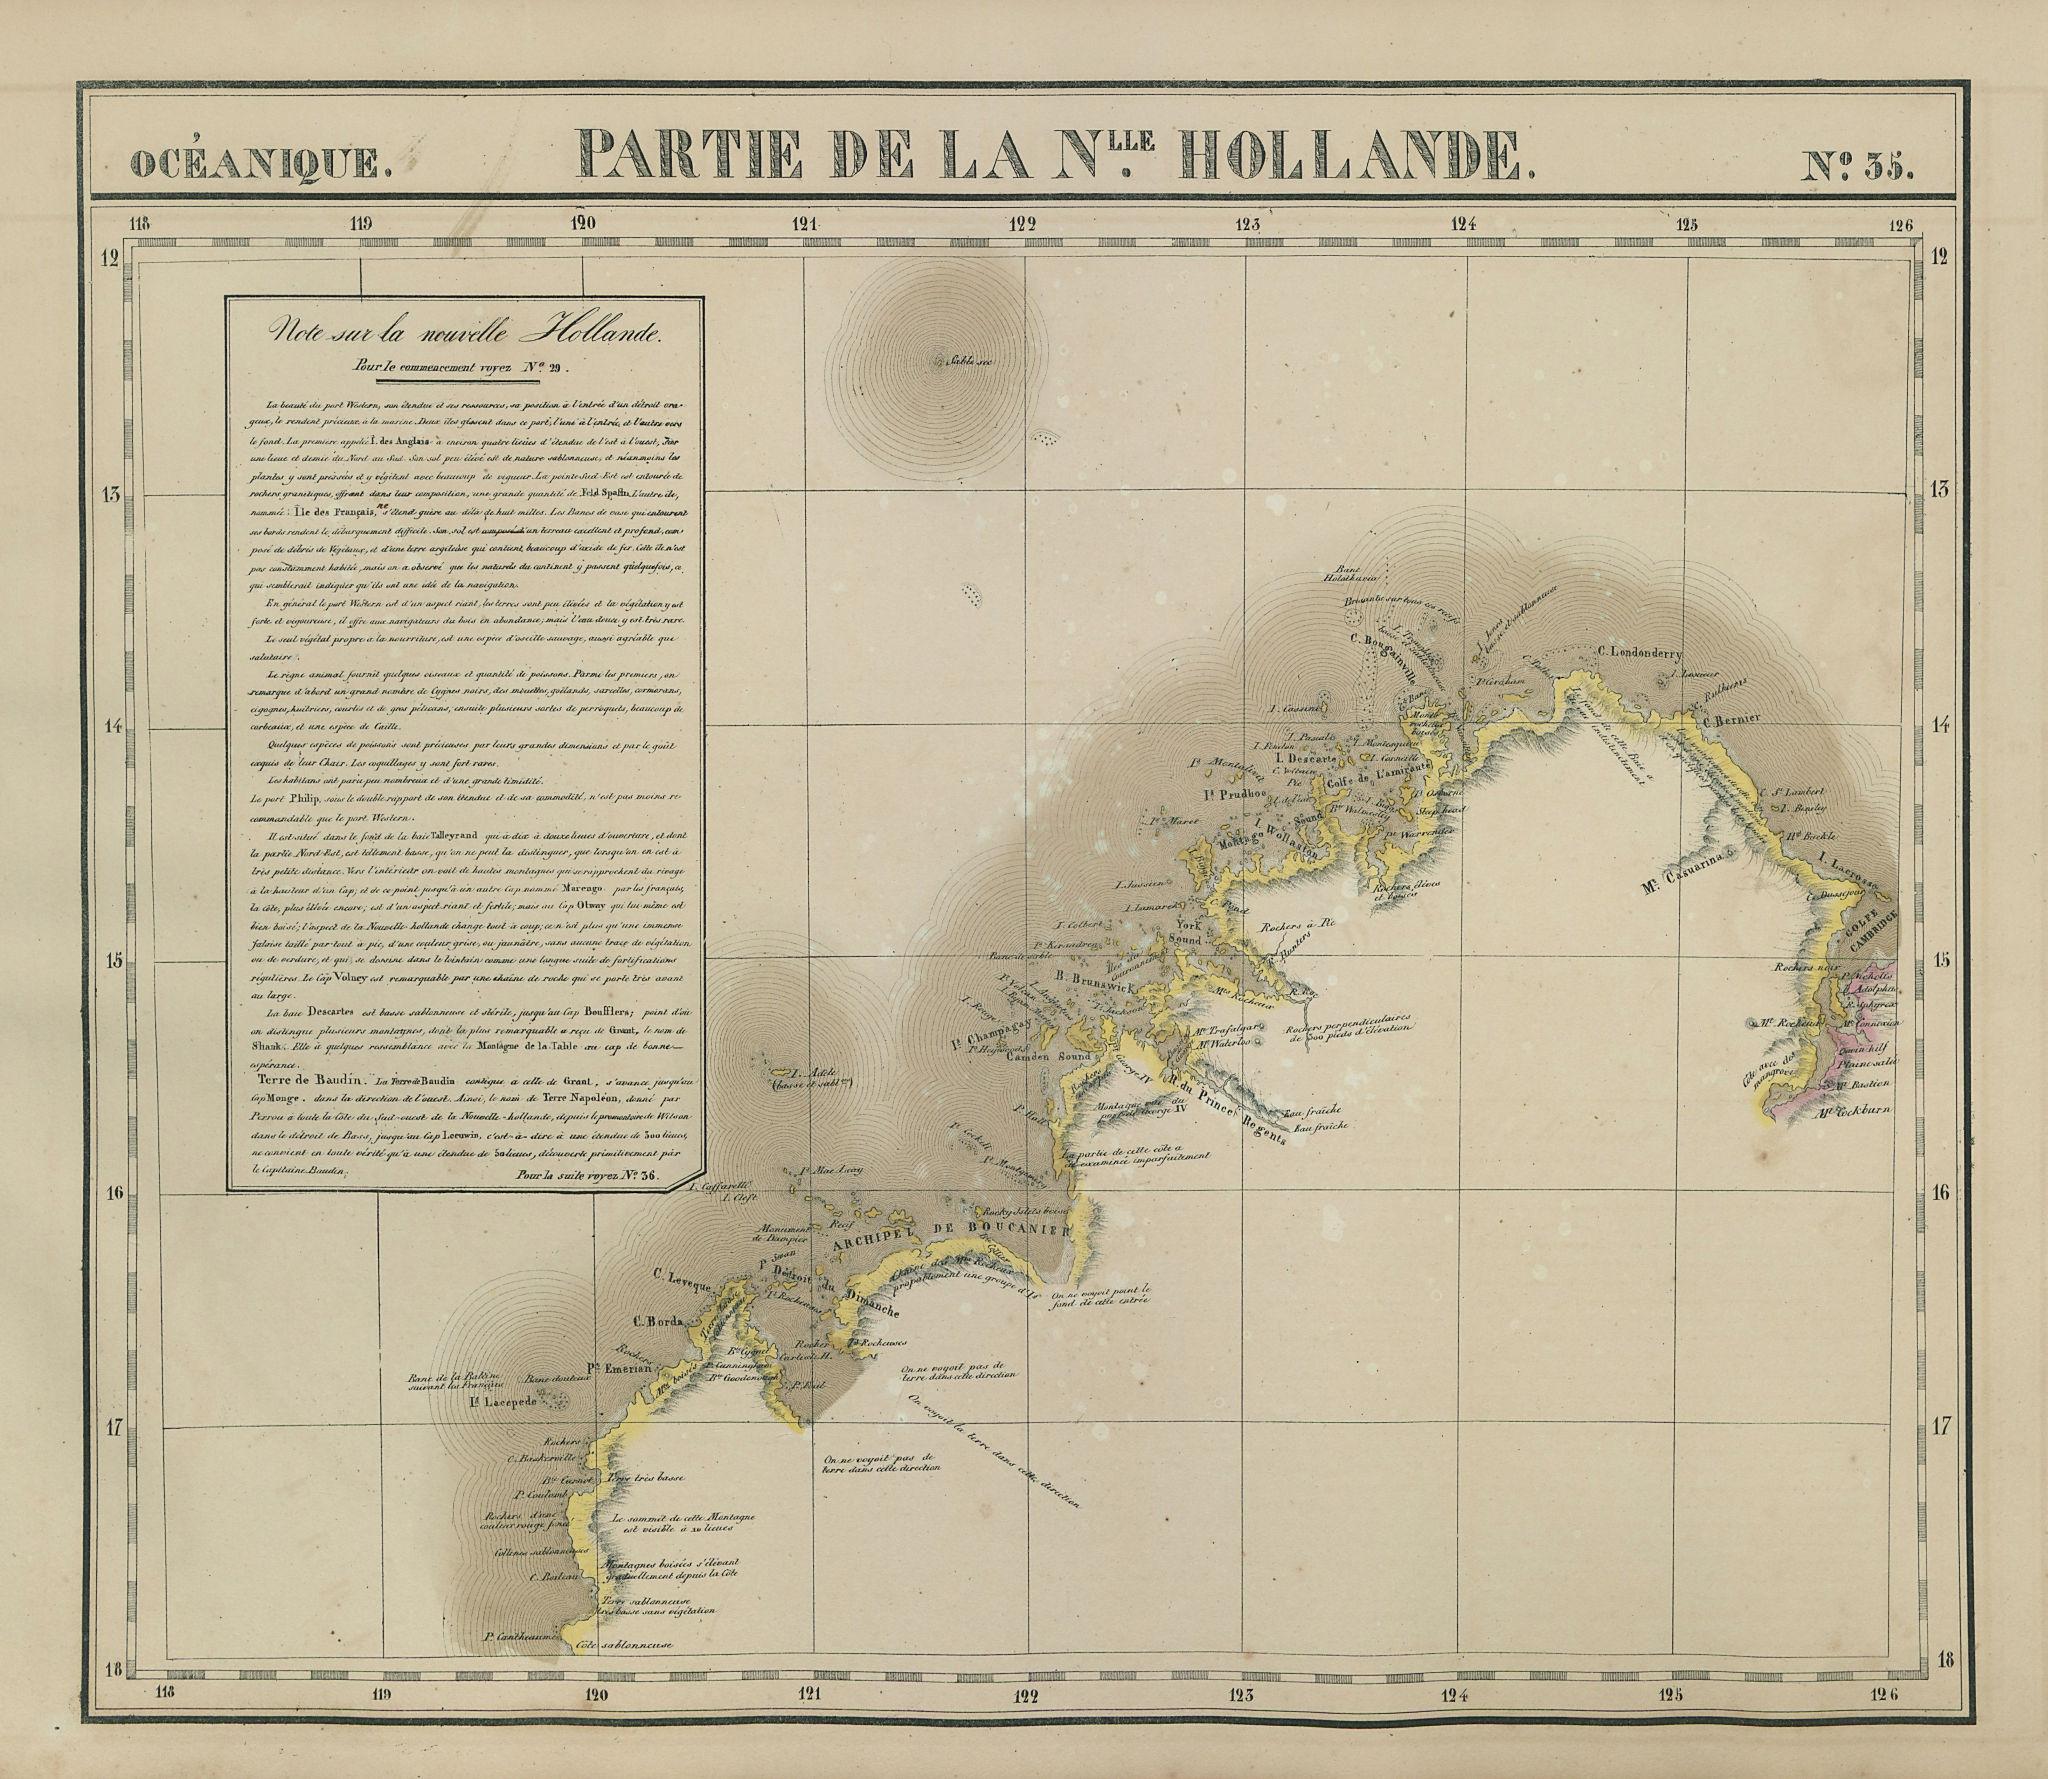 Océanique Partie de la Nlle Hollande #35 Western Australia VANDERMAELEN 1827 map